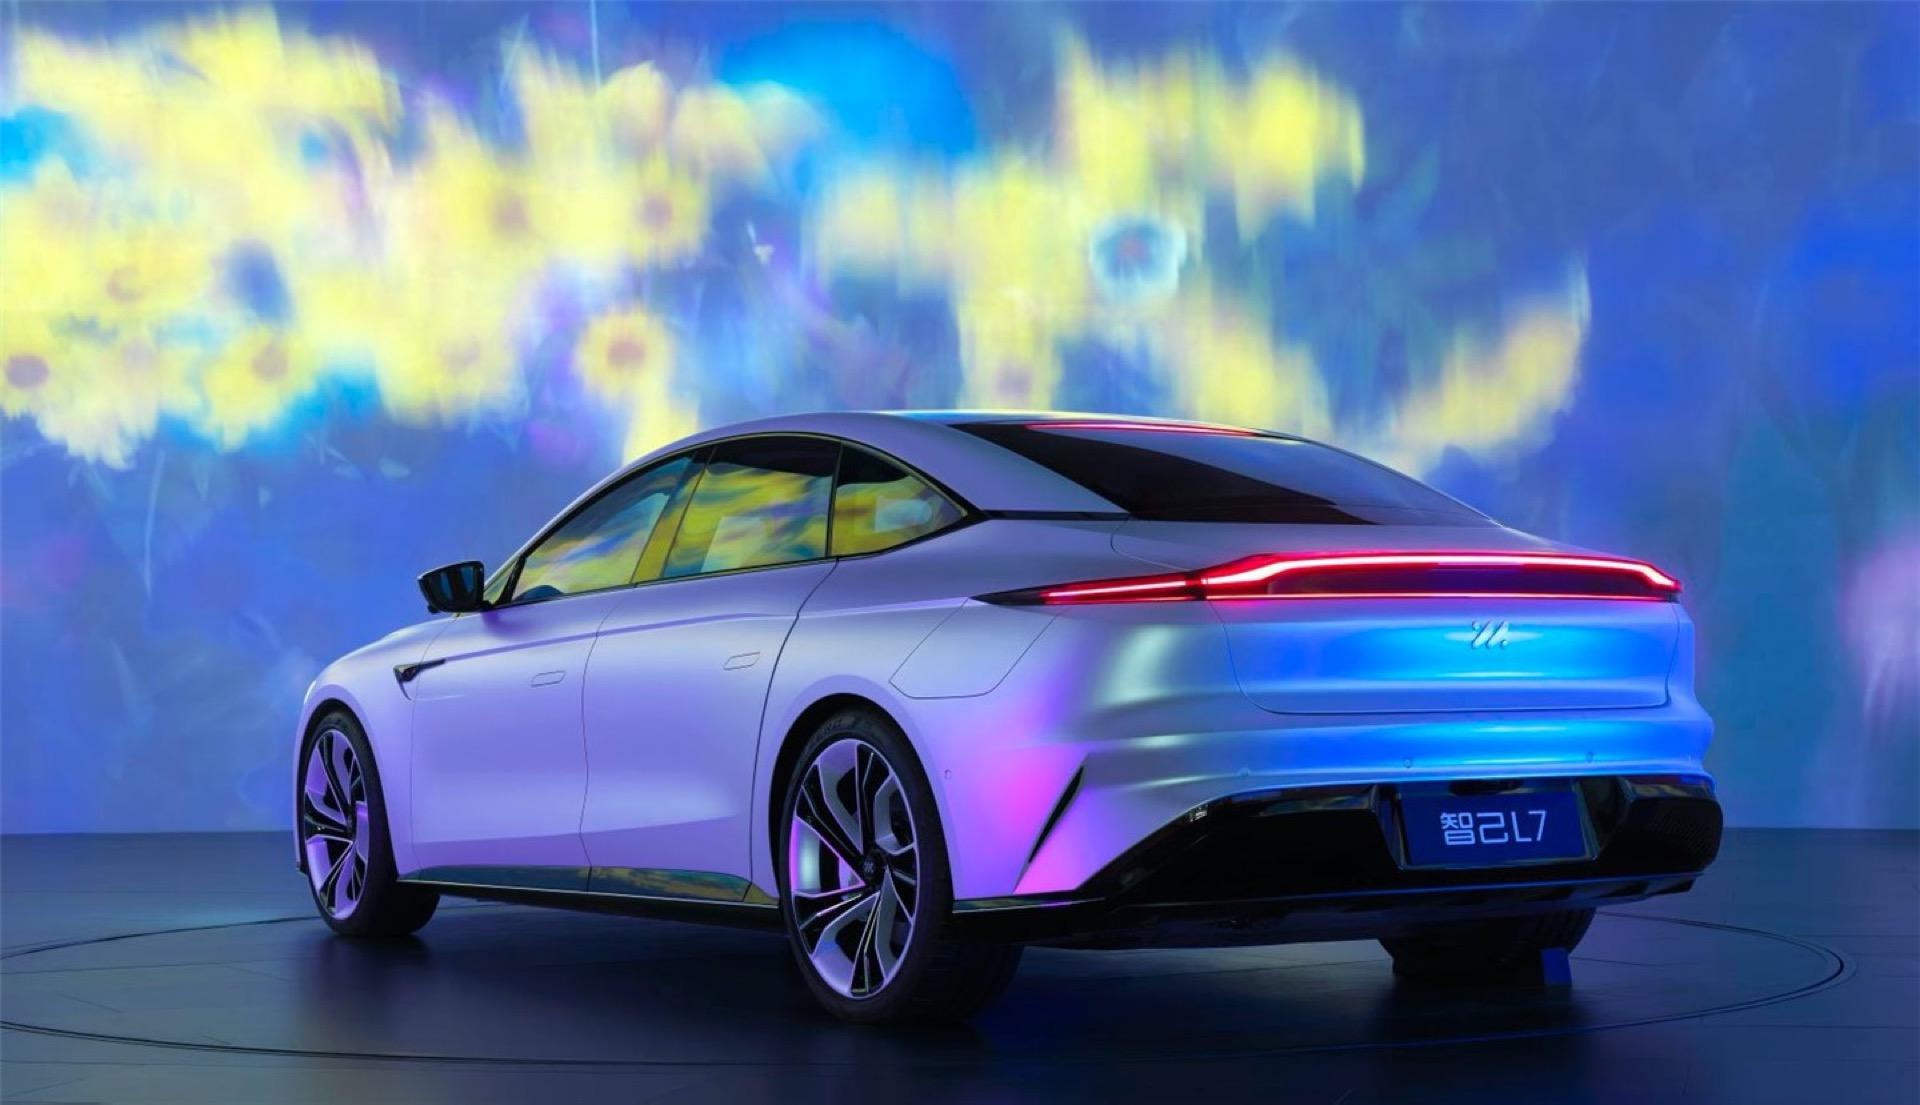 Kablosuz şarj özelliğine sahip elektrikli otomobil: Zhiji IM L7